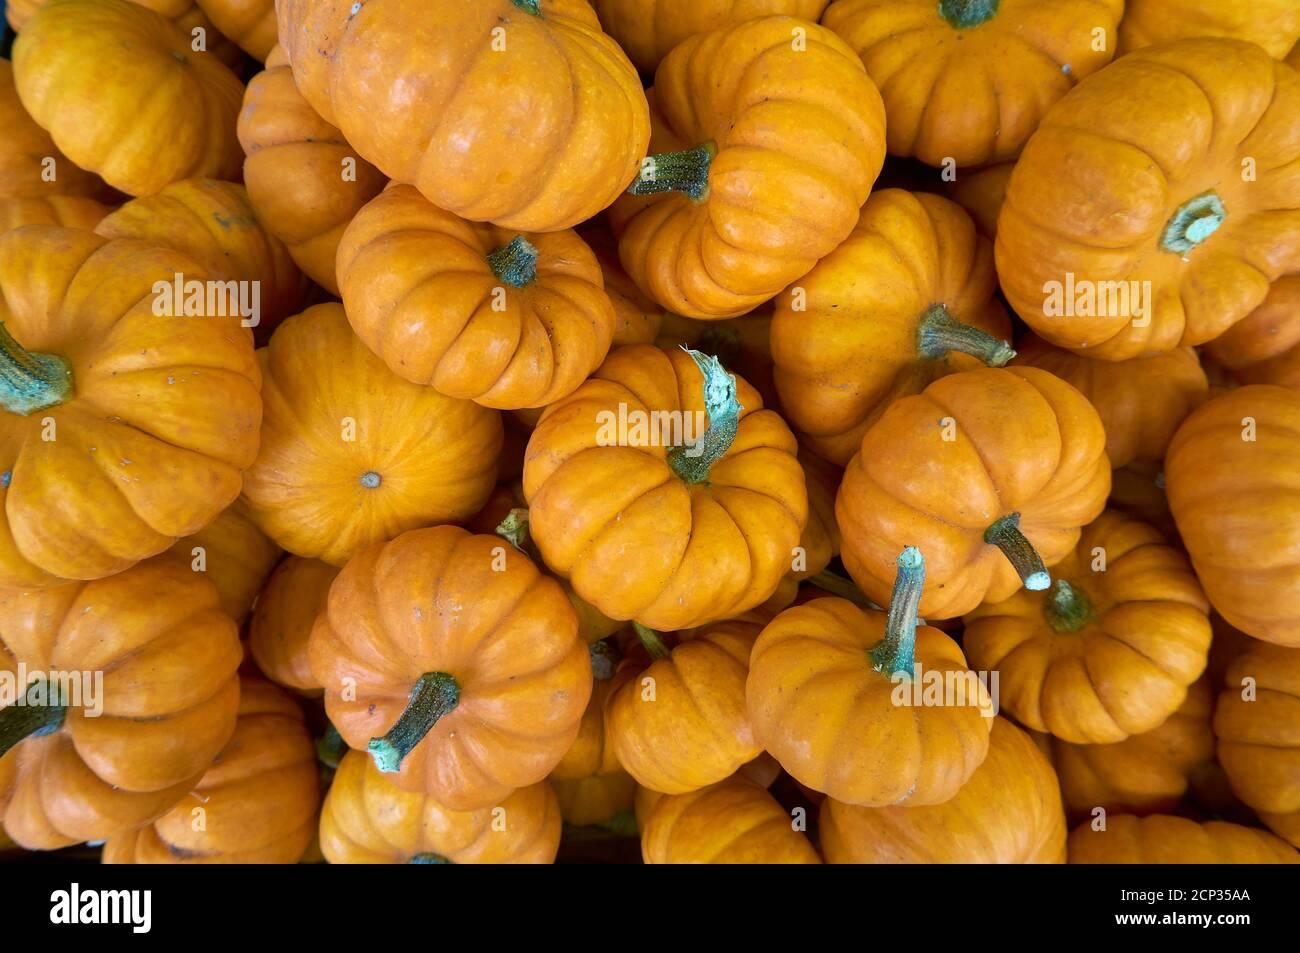 miniature-pumpkins-for-sale-in-a-market-